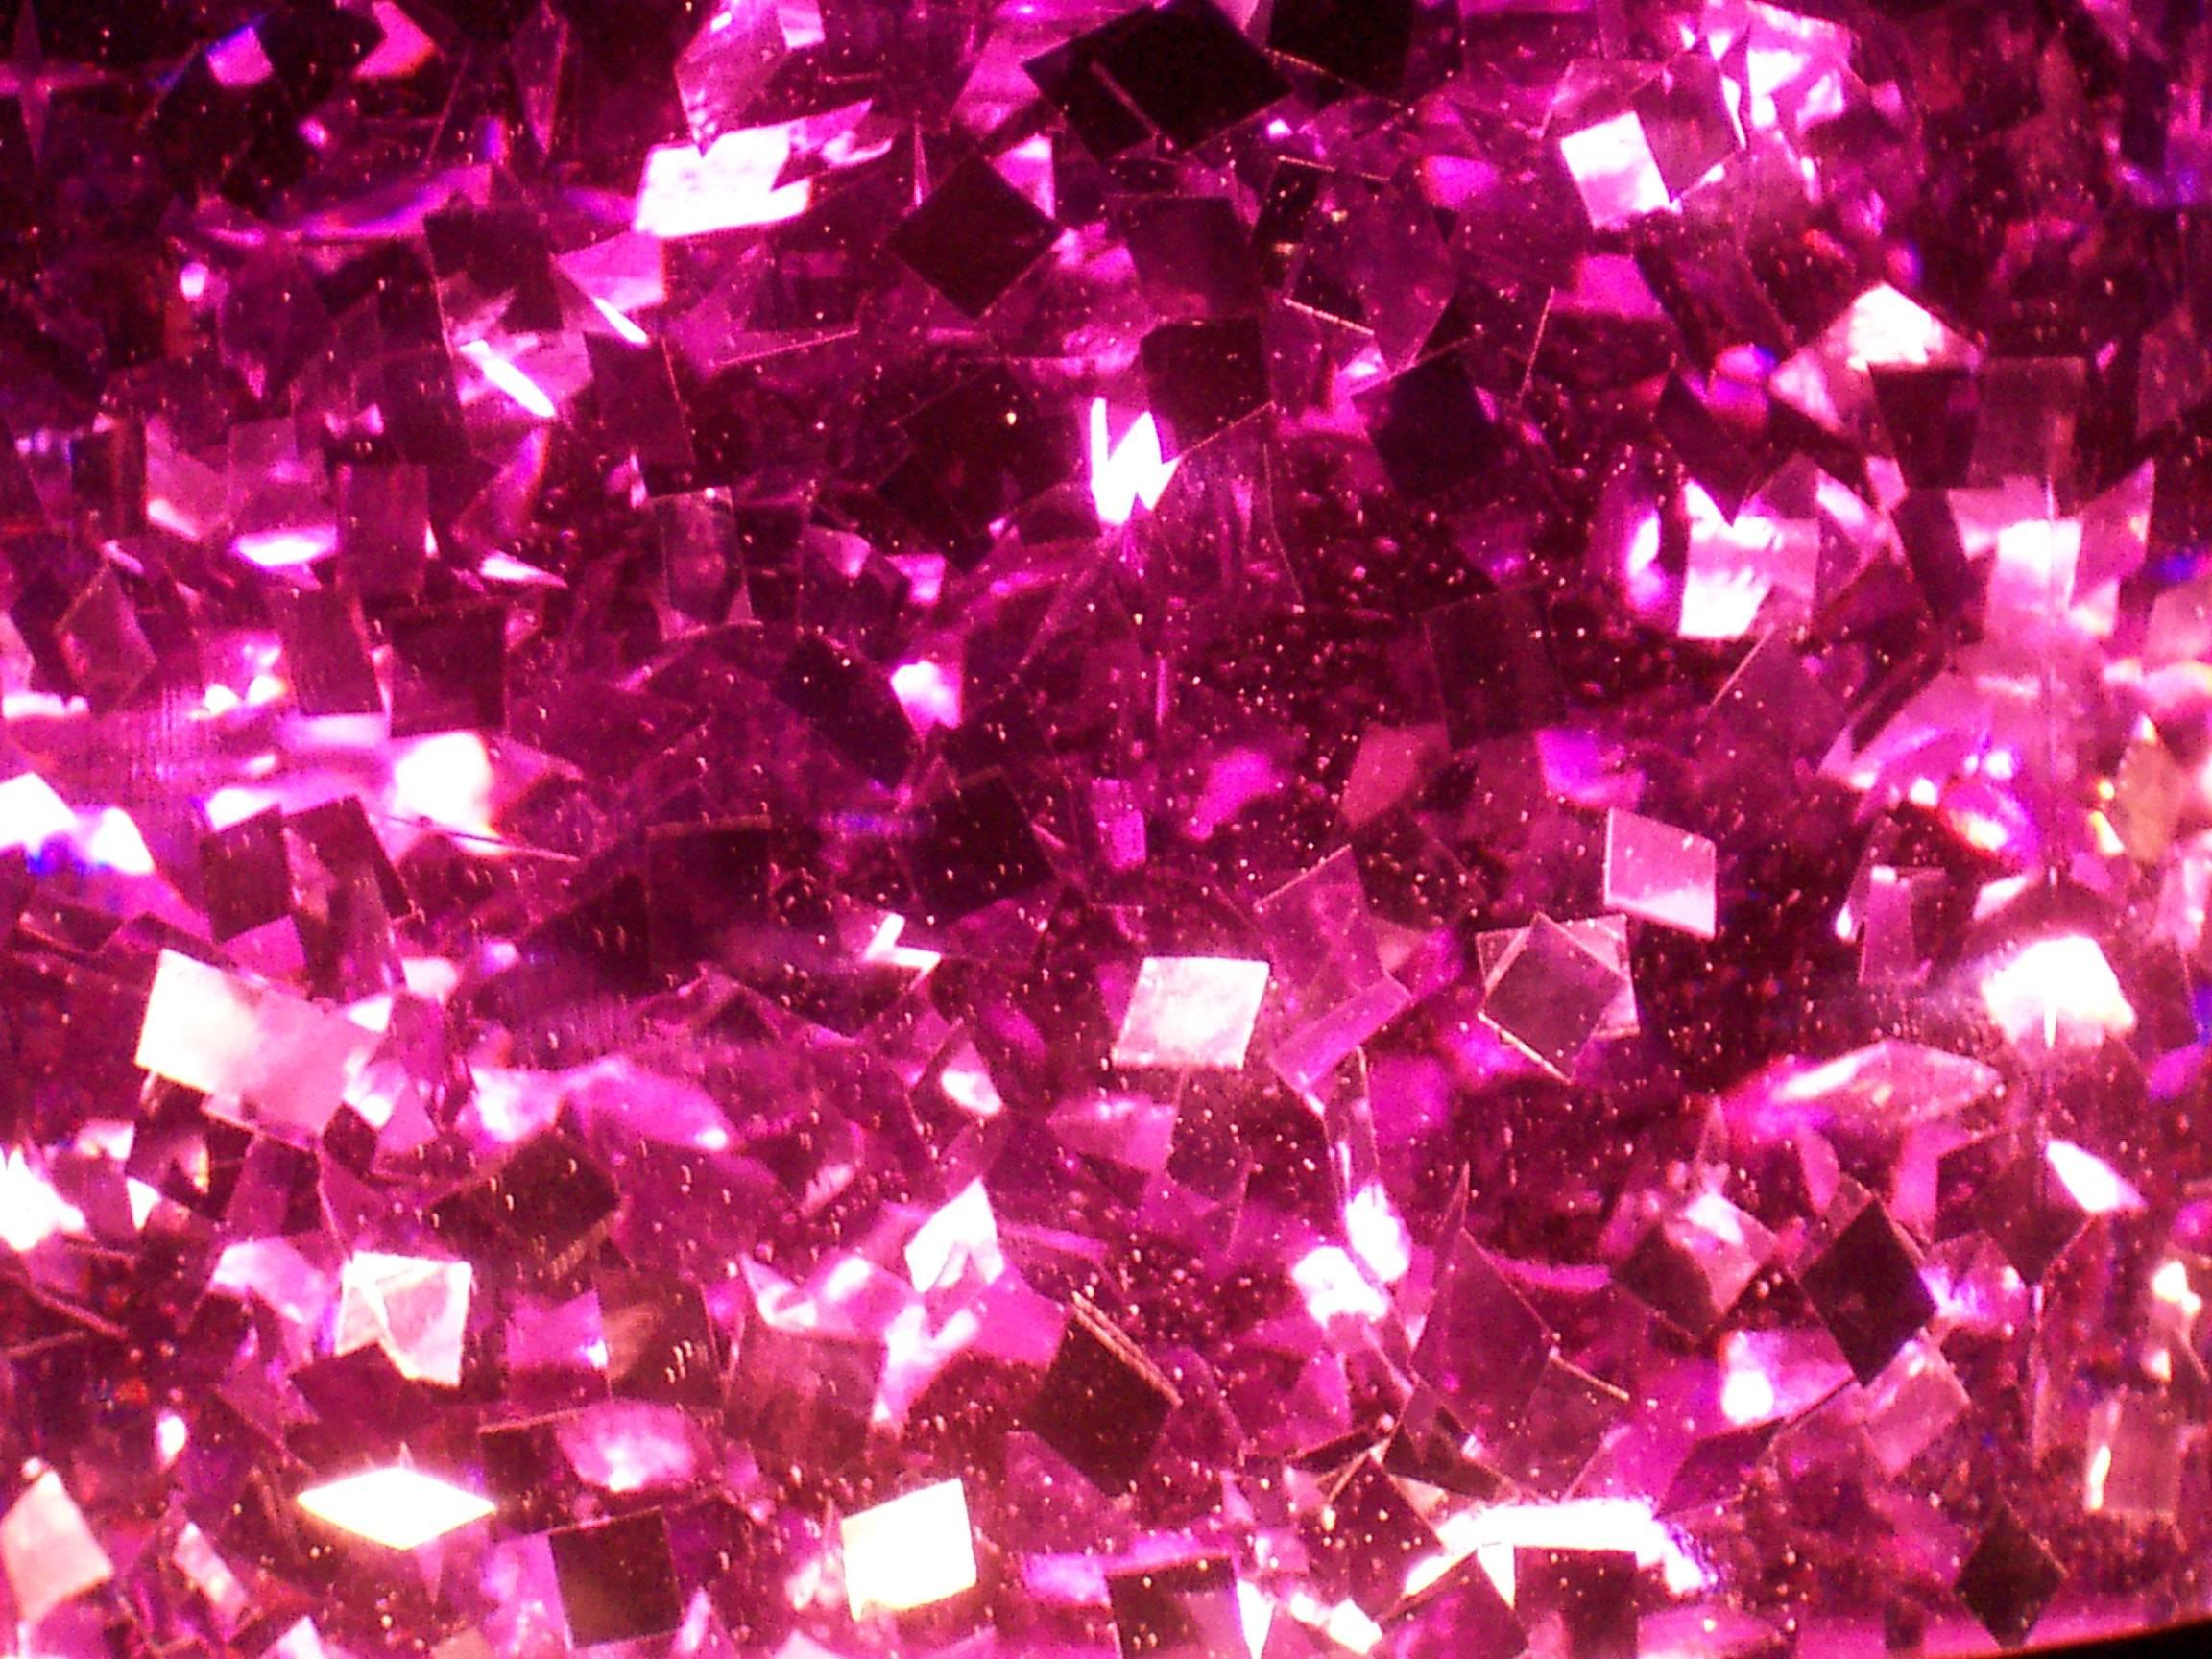 pink   Glitter Picture 2304x1728